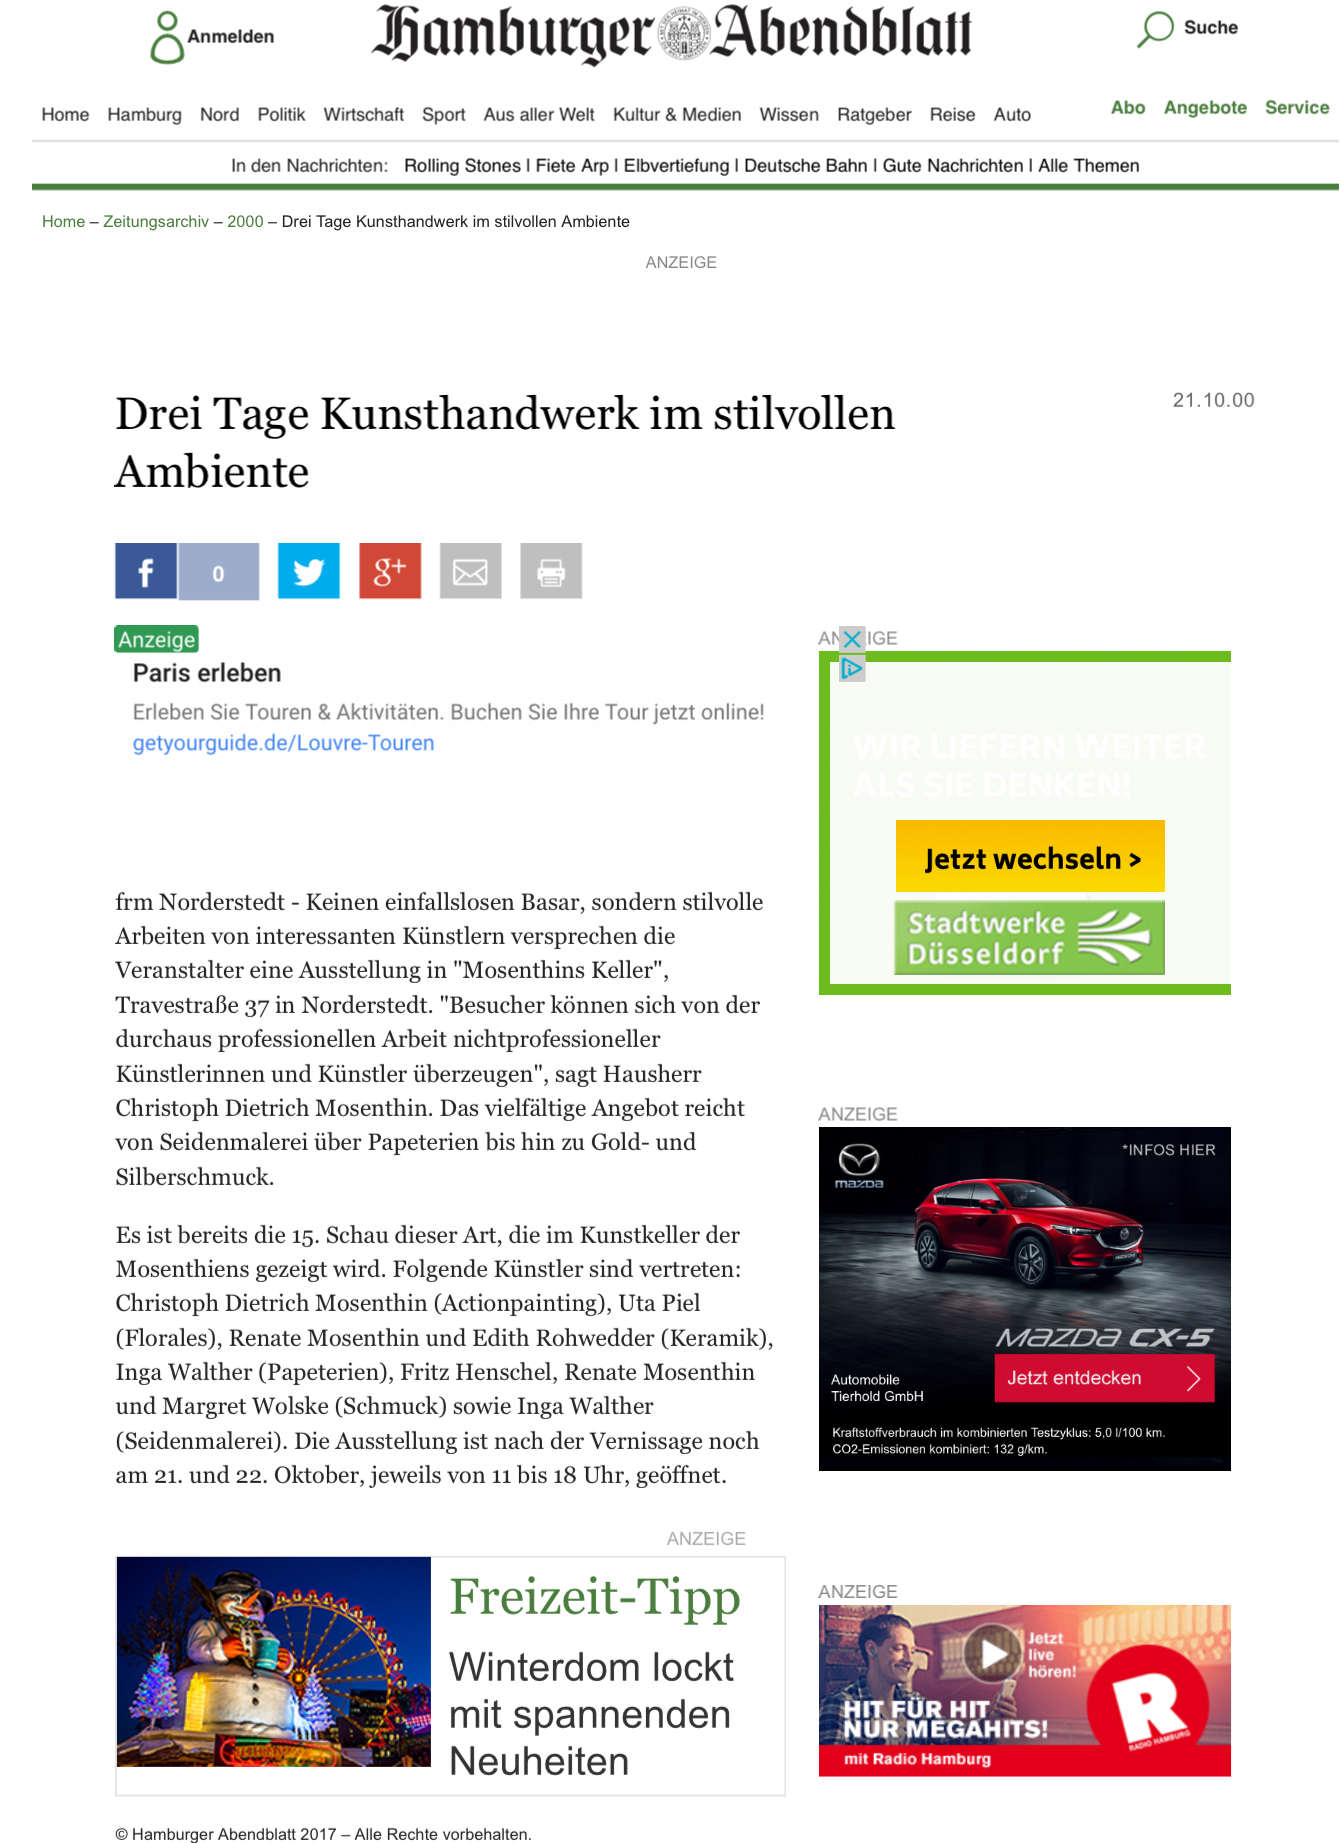 2000_10 Hamburger Abendblatt